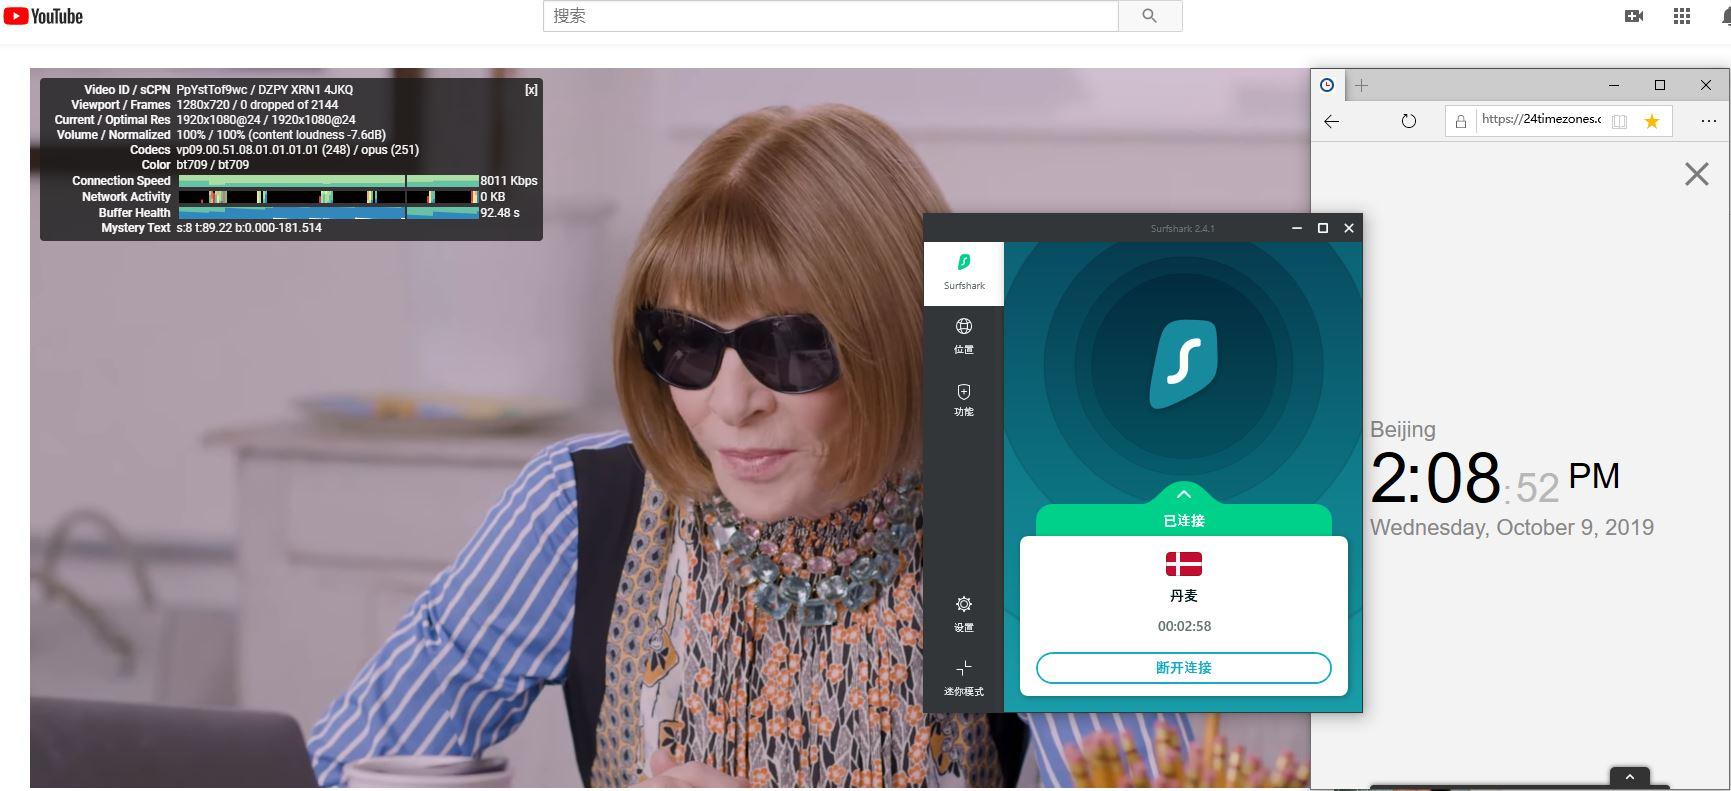 Windows SurfsharkVPN-丹麦 中国VPN翻墙 科学上网 YouTube速测-20191009